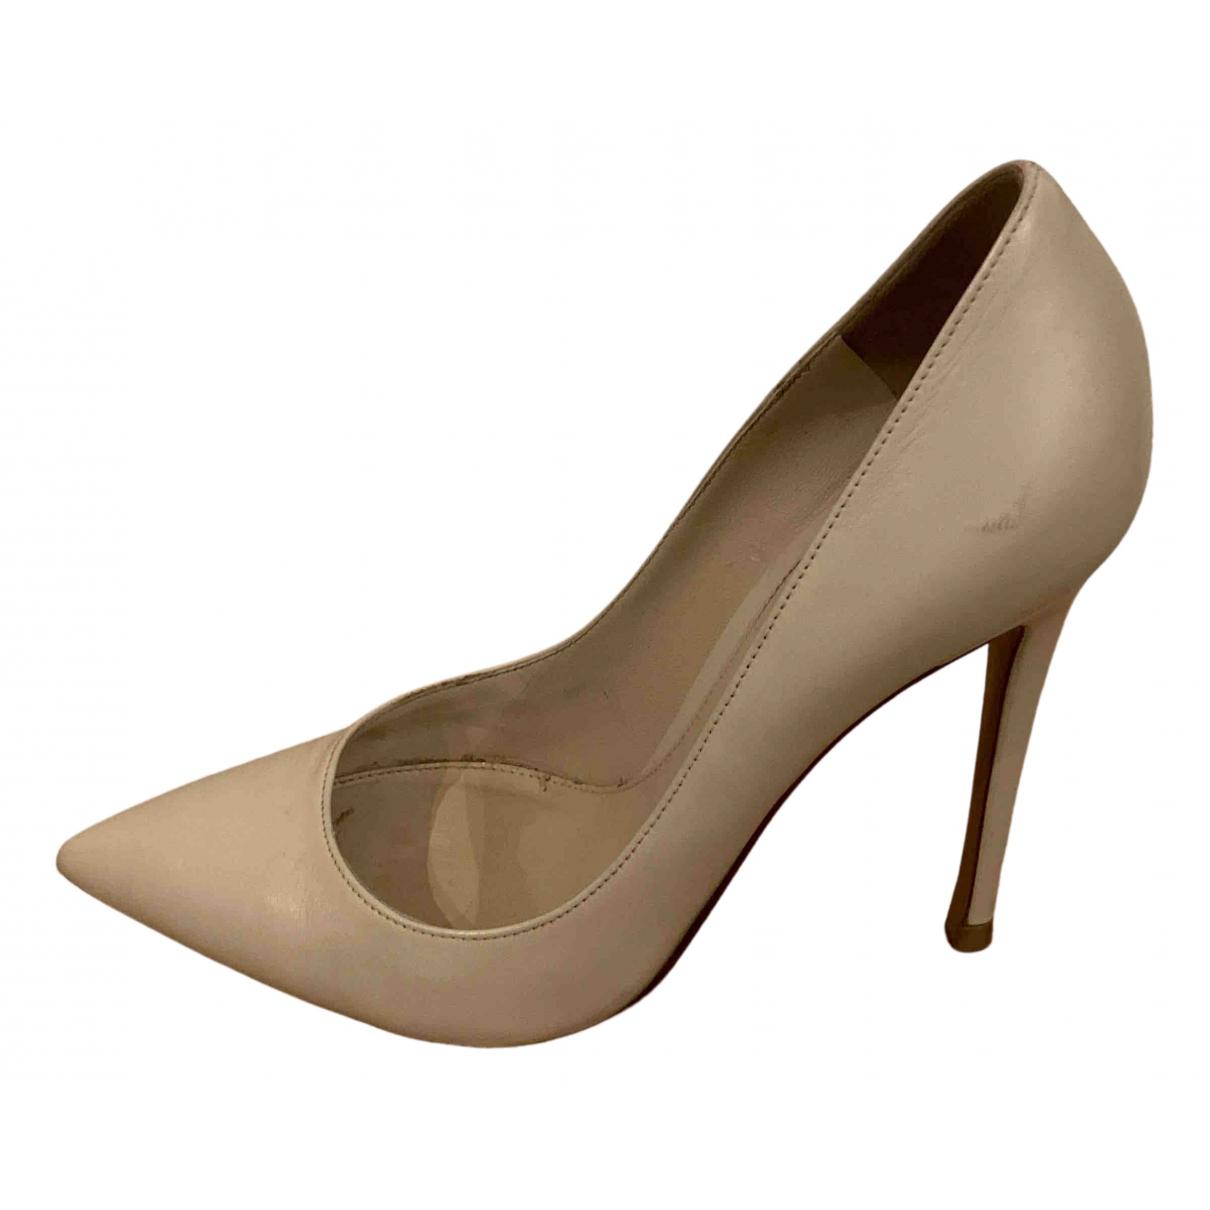 Gianvito Rossi N Beige Leather Heels for Women 36 EU